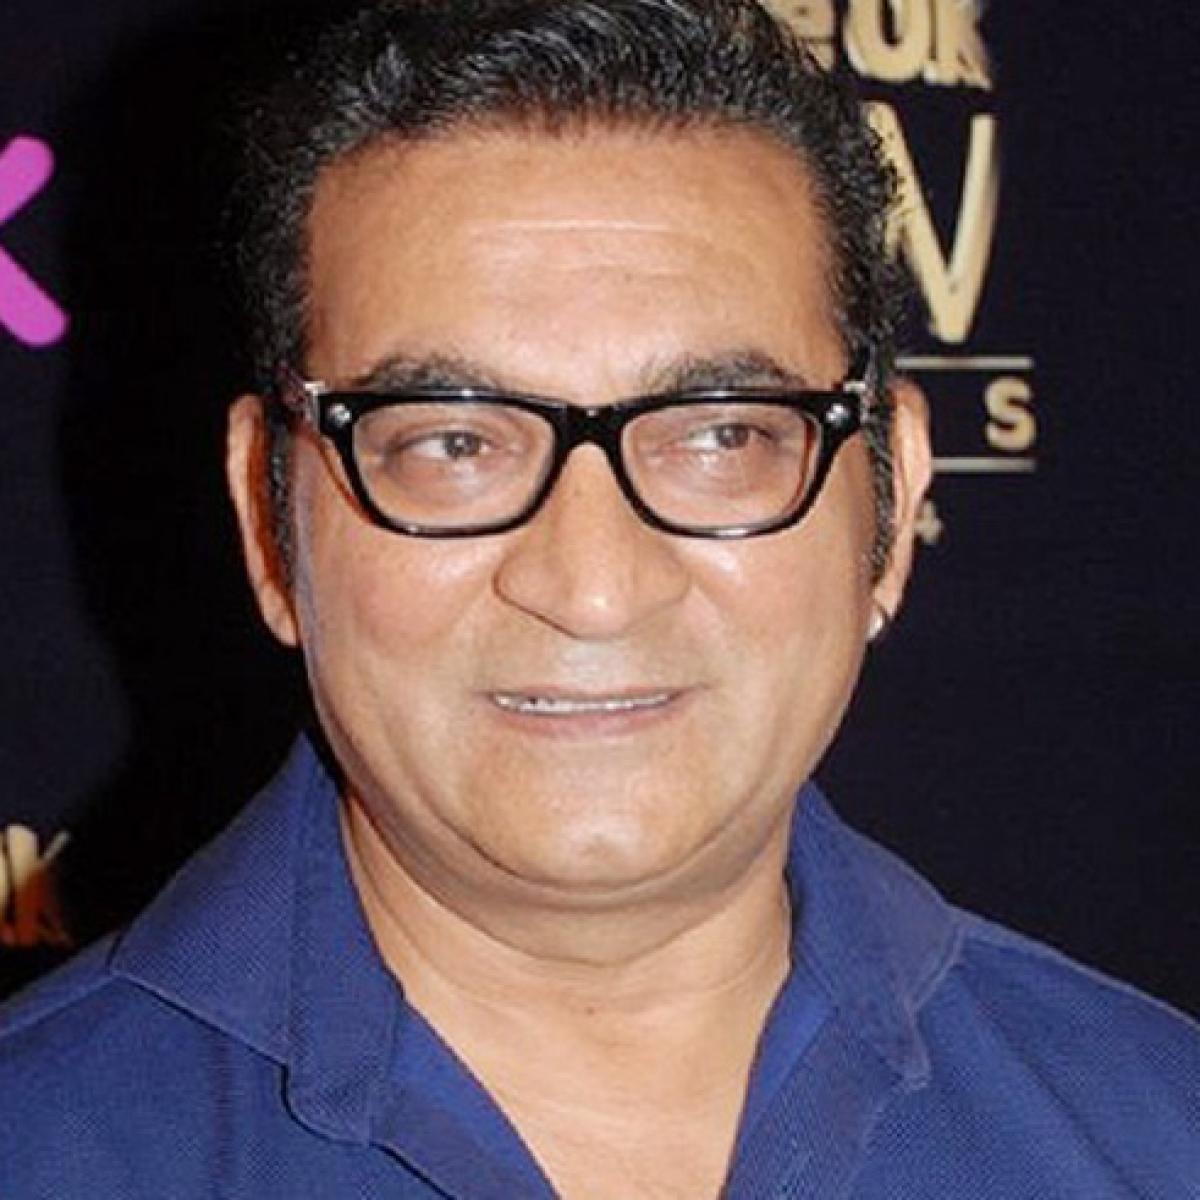 Singer Abhijeet Bhattacharya's son Dhruv tests COVID-19 positive